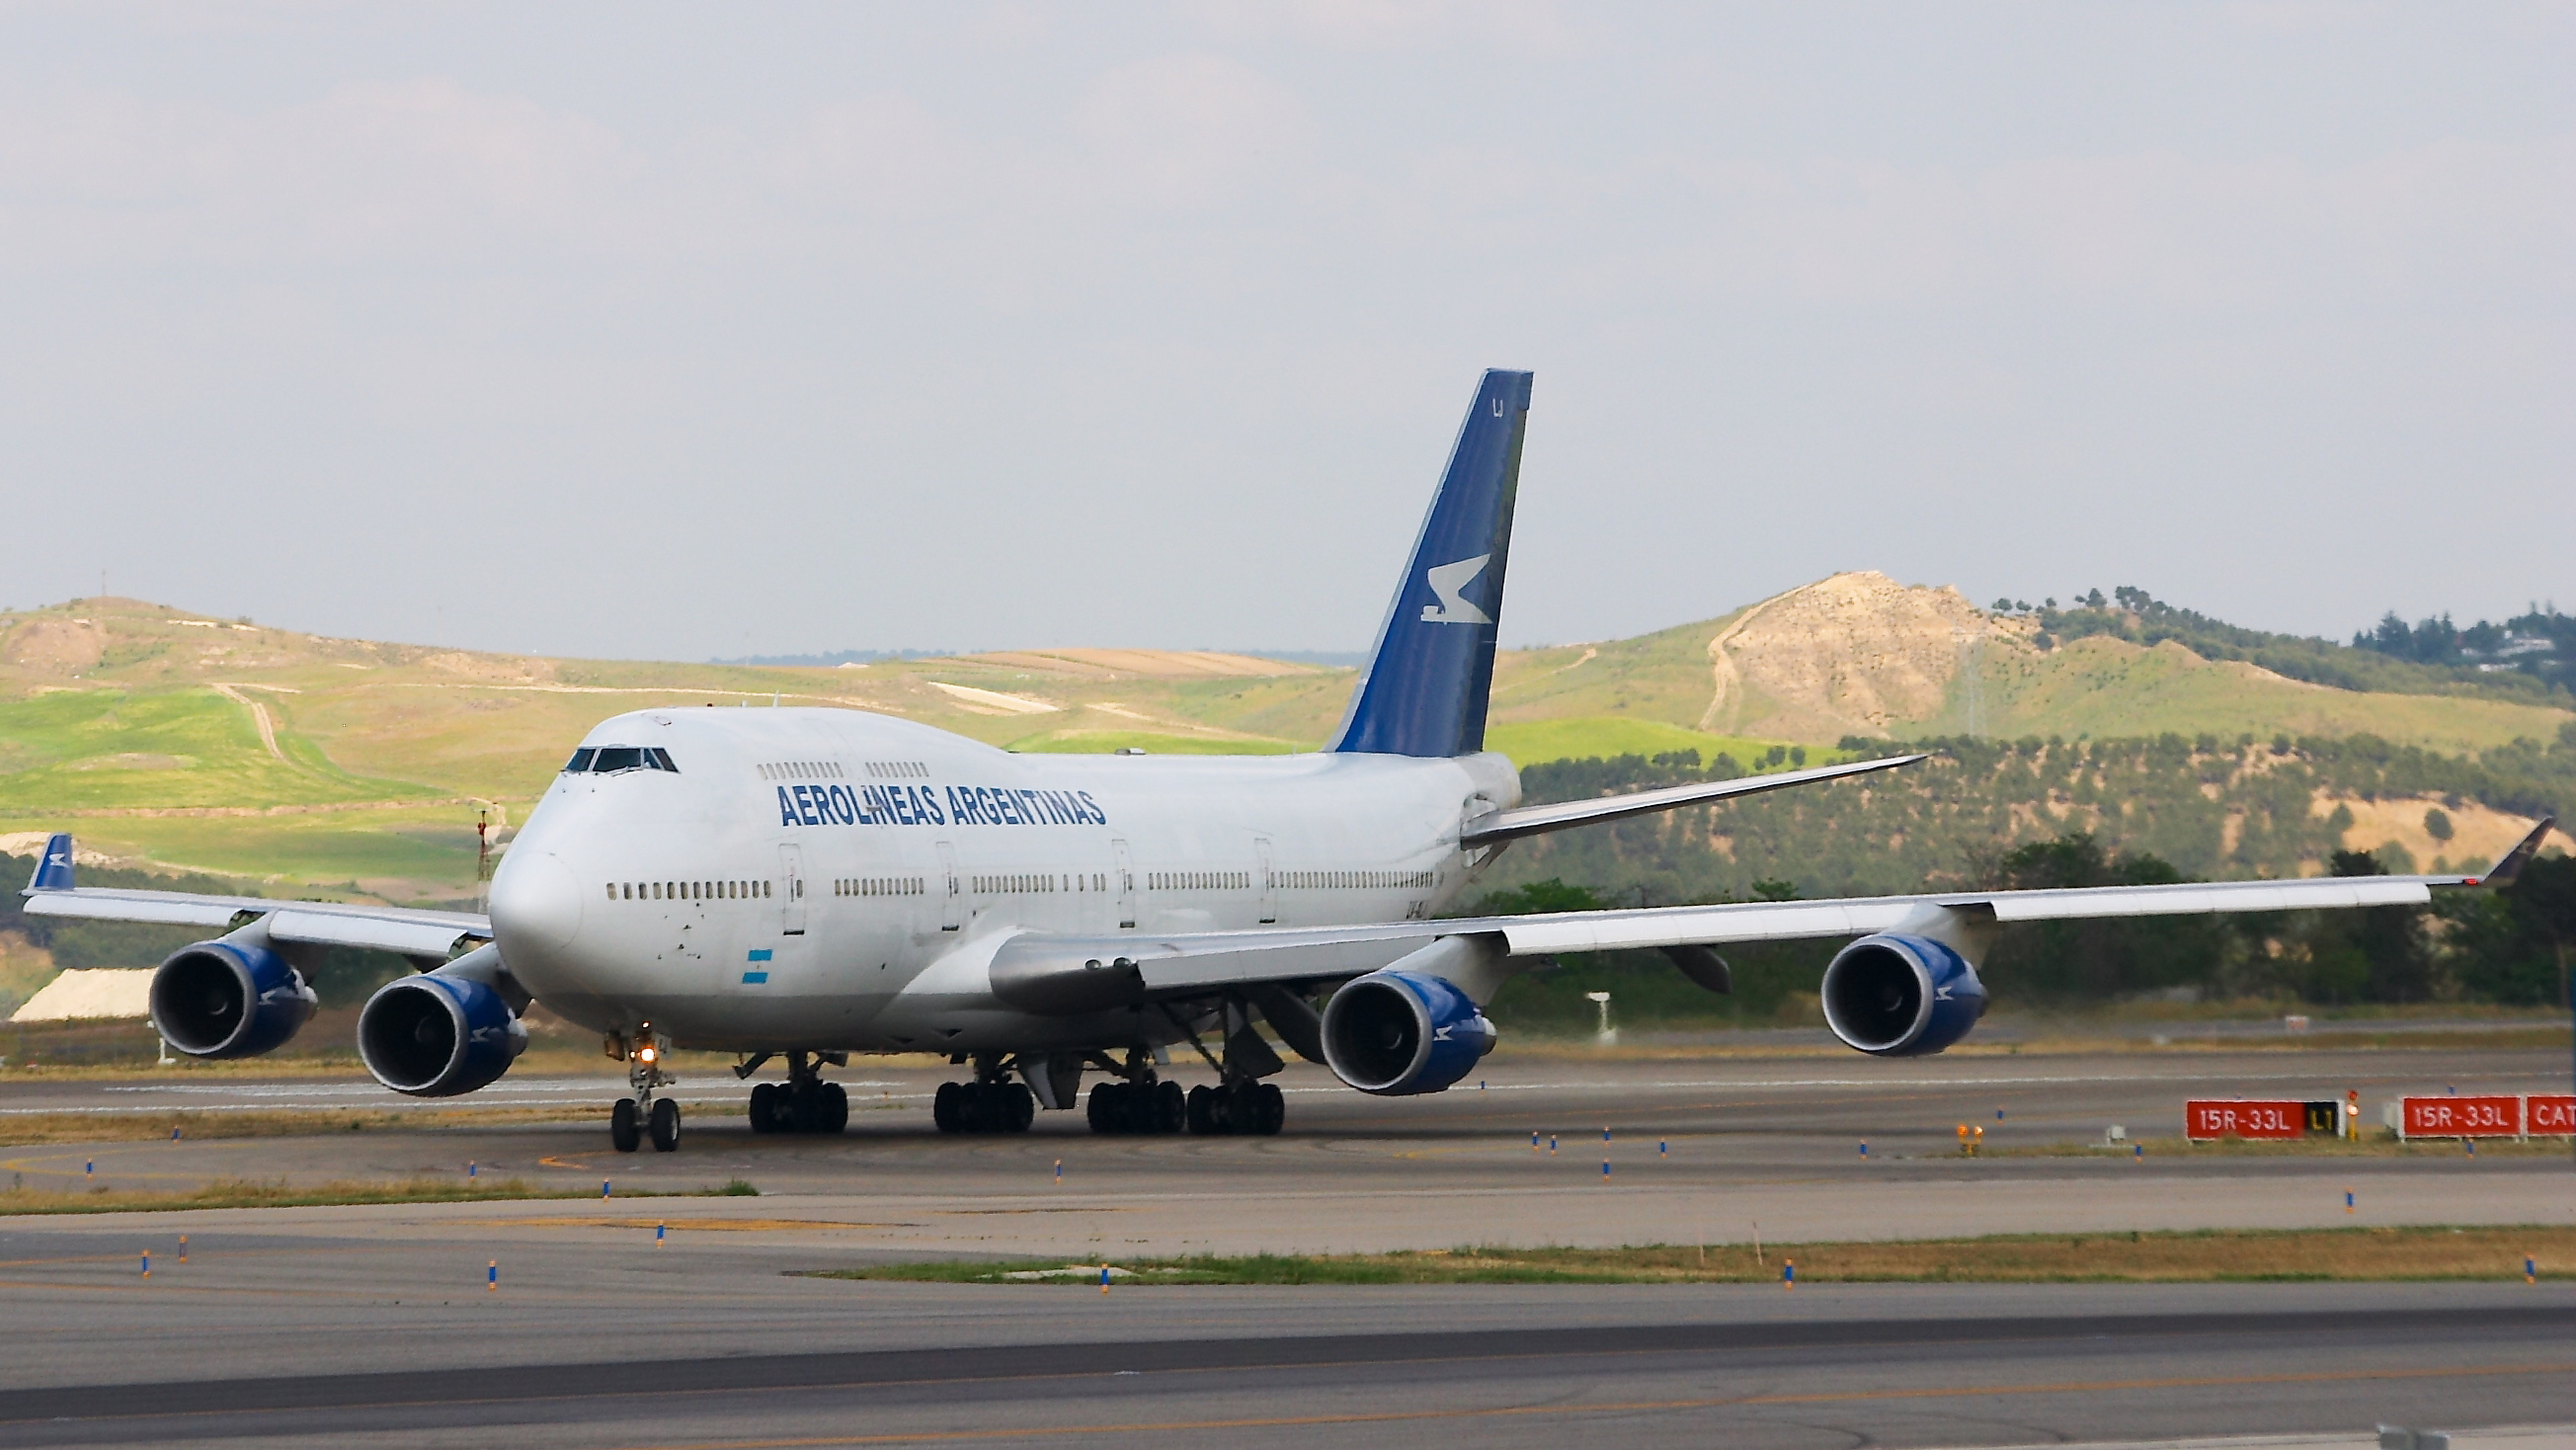 http://upload.wikimedia.org/wikipedia/commons/5/52/Boeing_747-475_-_Aerol%C3%ADneas_Argentinas_-_LV-ALJ_-_LEMD_%281%29.jpg